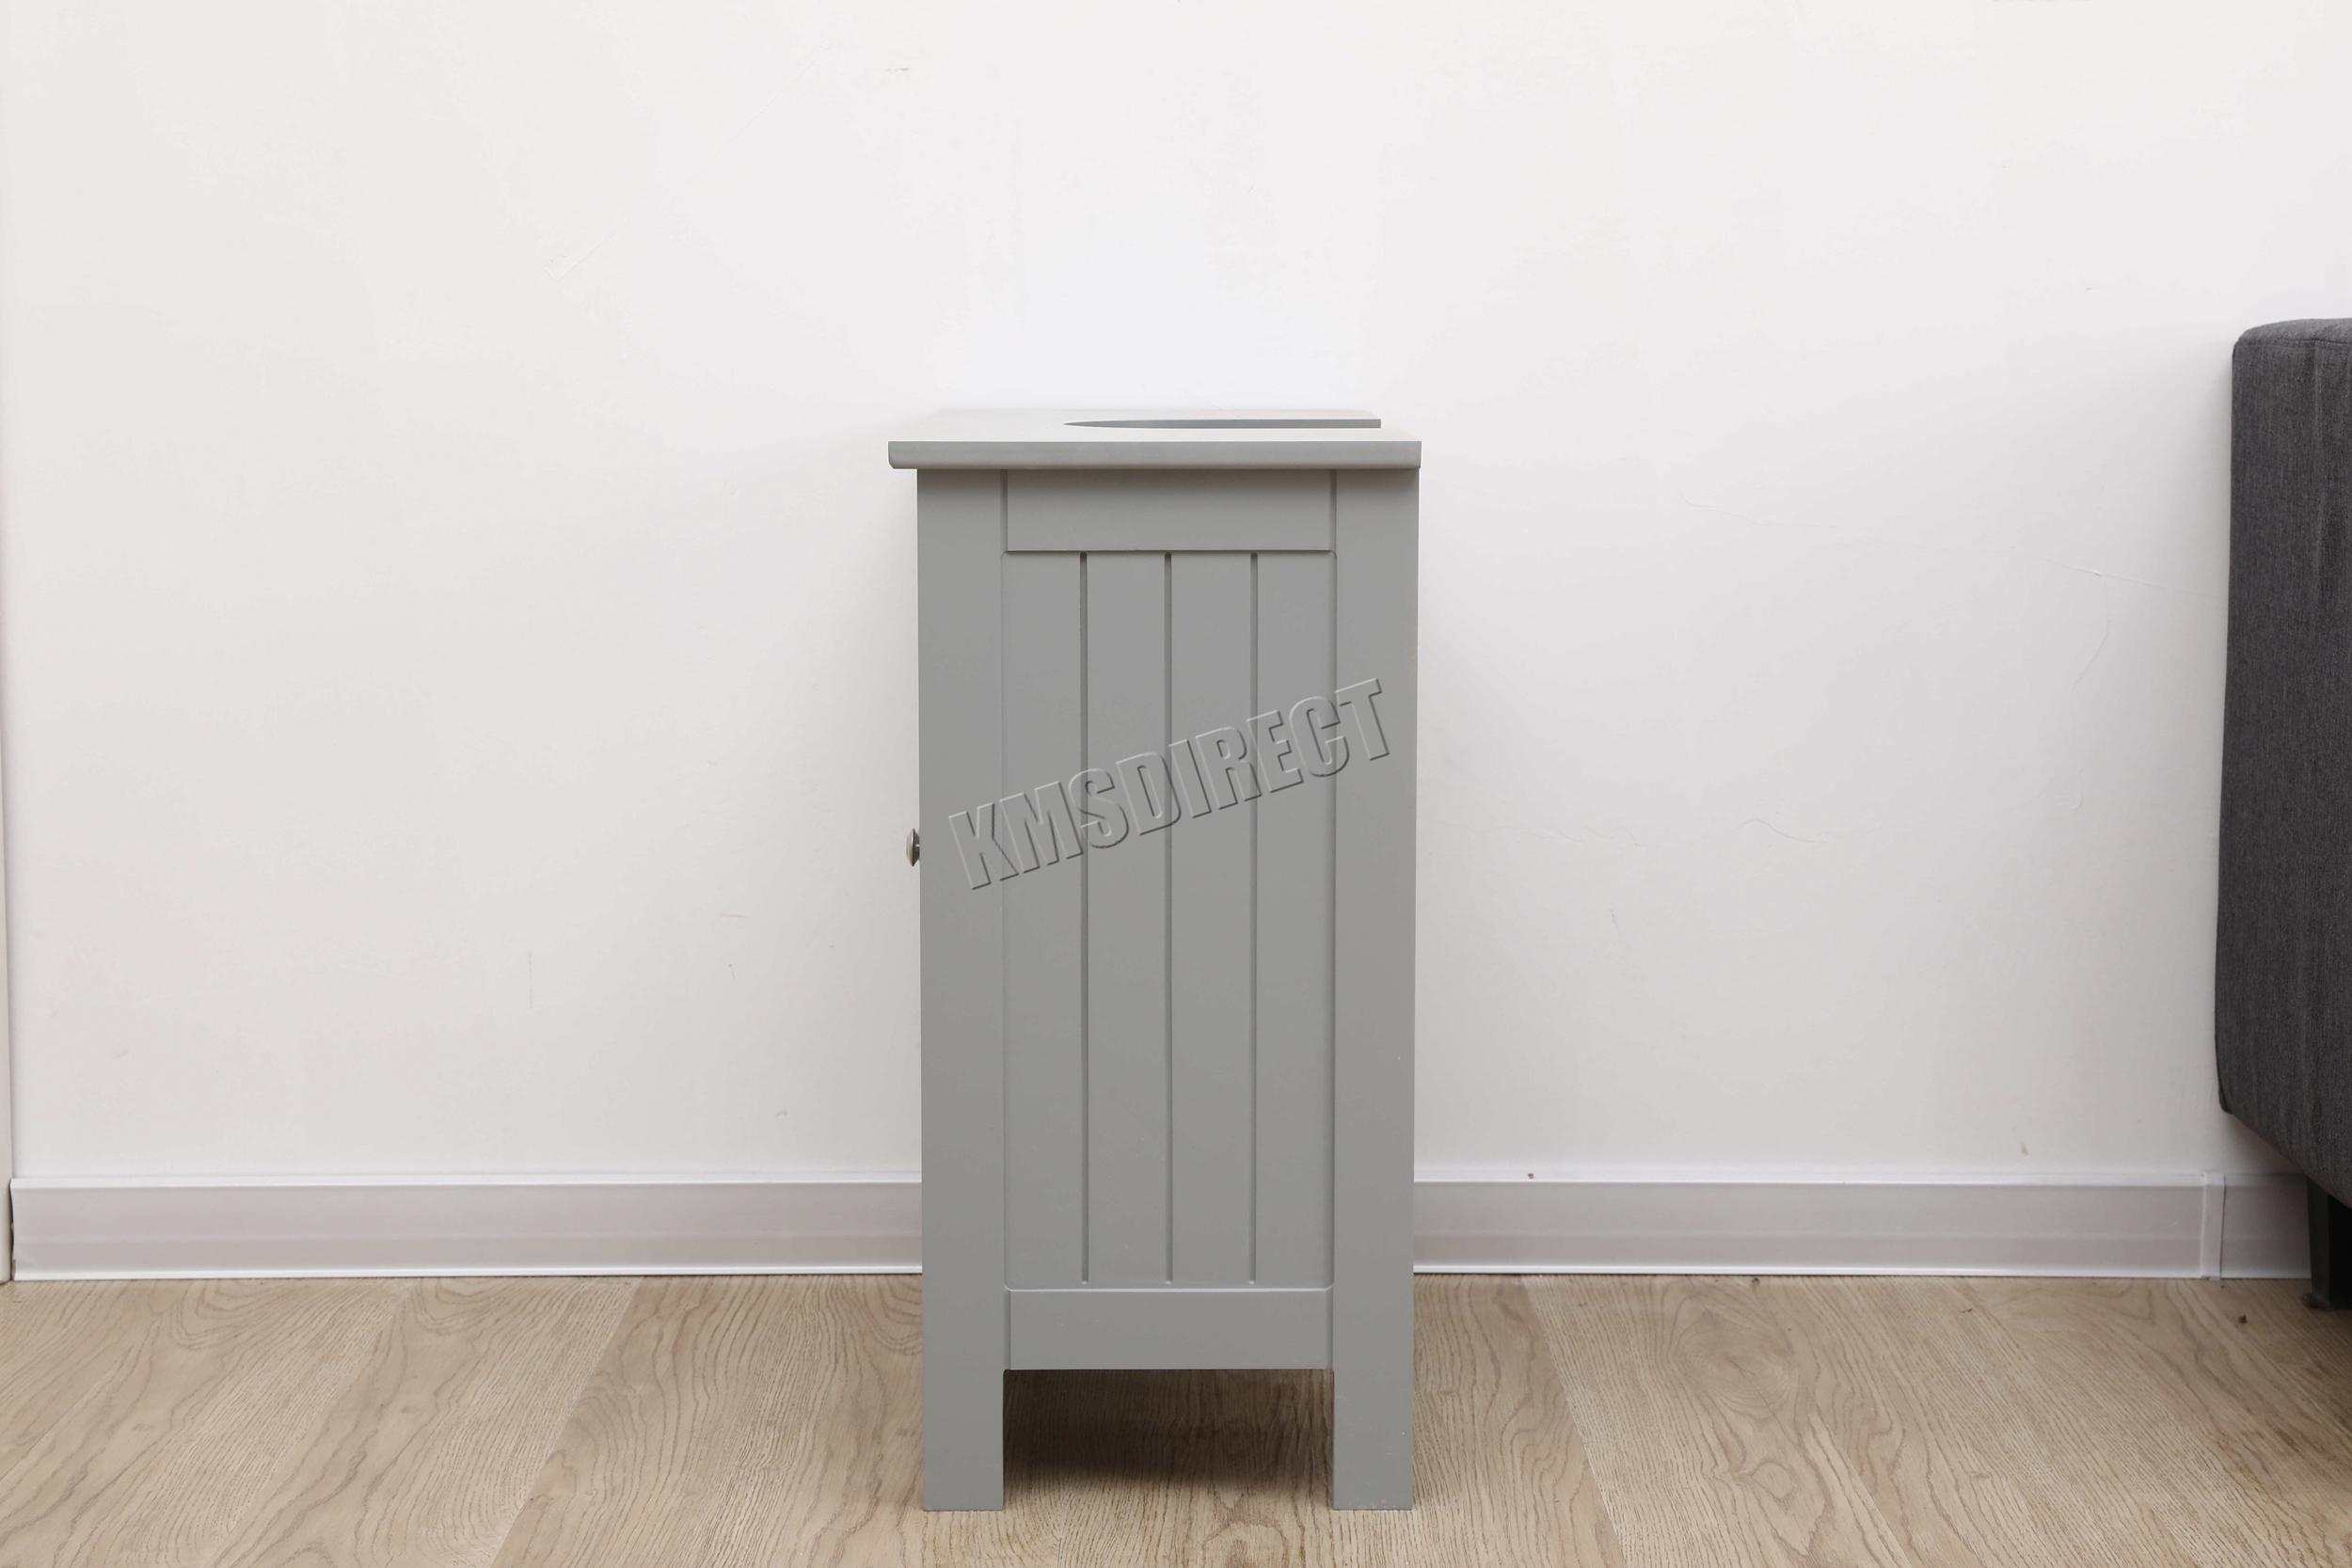 WestWood-Vanity-Unit-Wooden-Under-Sink-Wash-Basin-Bathroom-Cabinet-Storage thumbnail 16